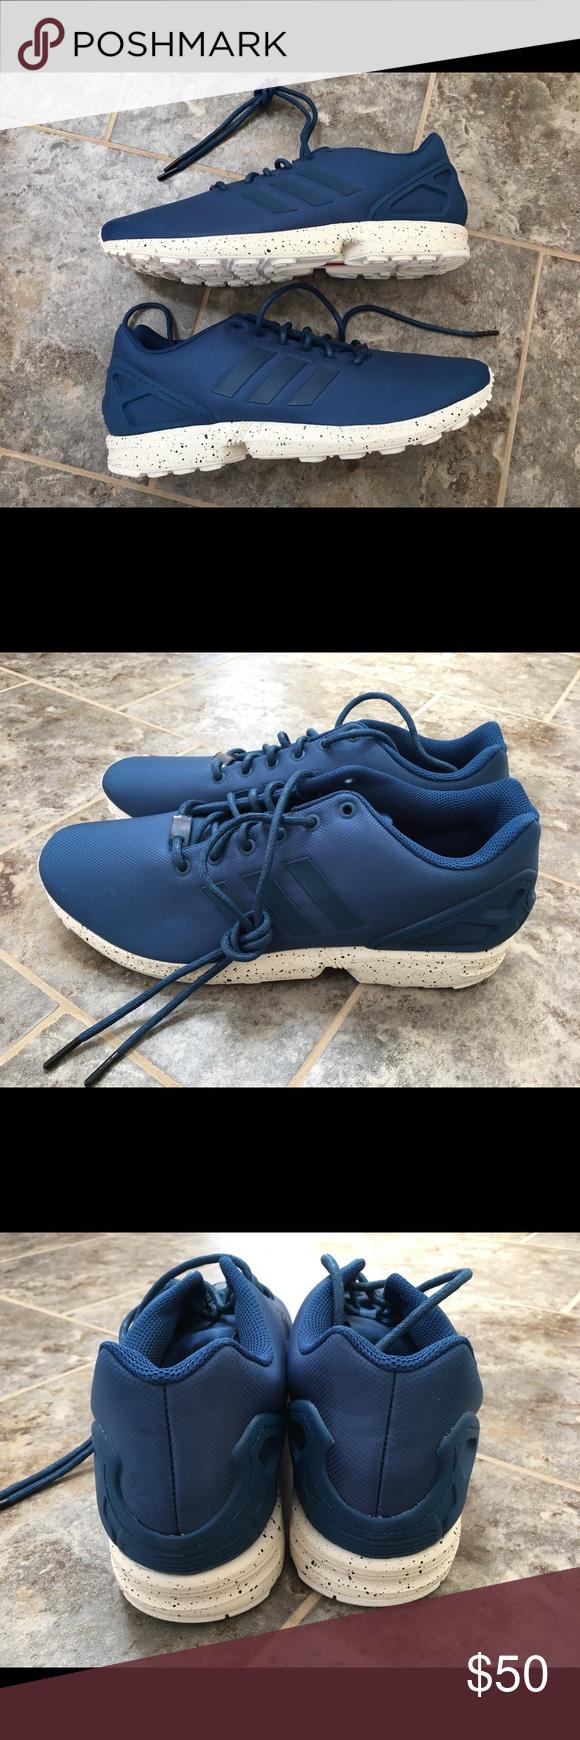 878ba7e3c064 adidas ZX Flux Tech Steel Utility Blue Size 12.5 New